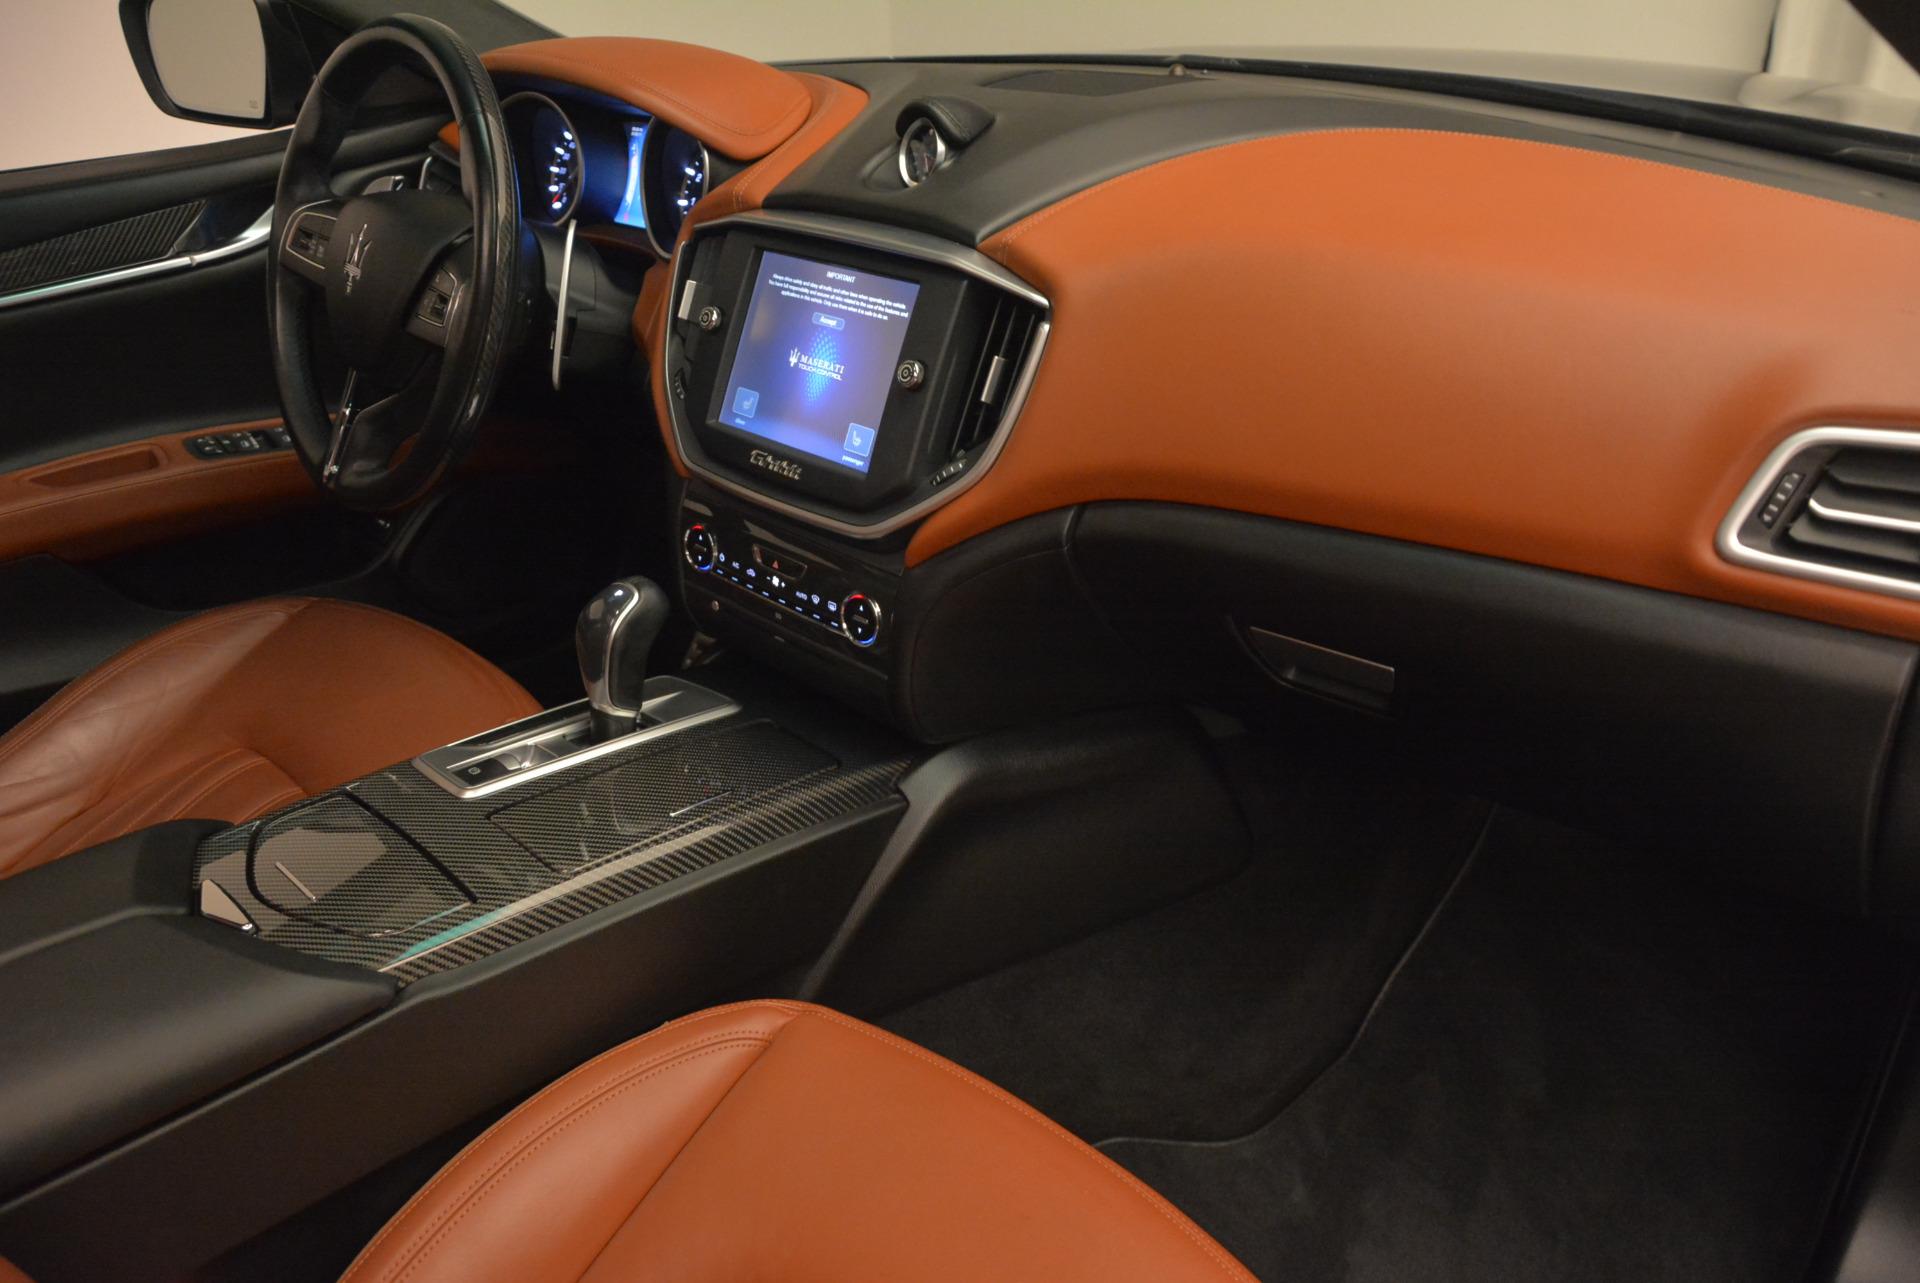 Used 2014 Maserati Ghibli S Q4 For Sale In Westport, CT 805_p20